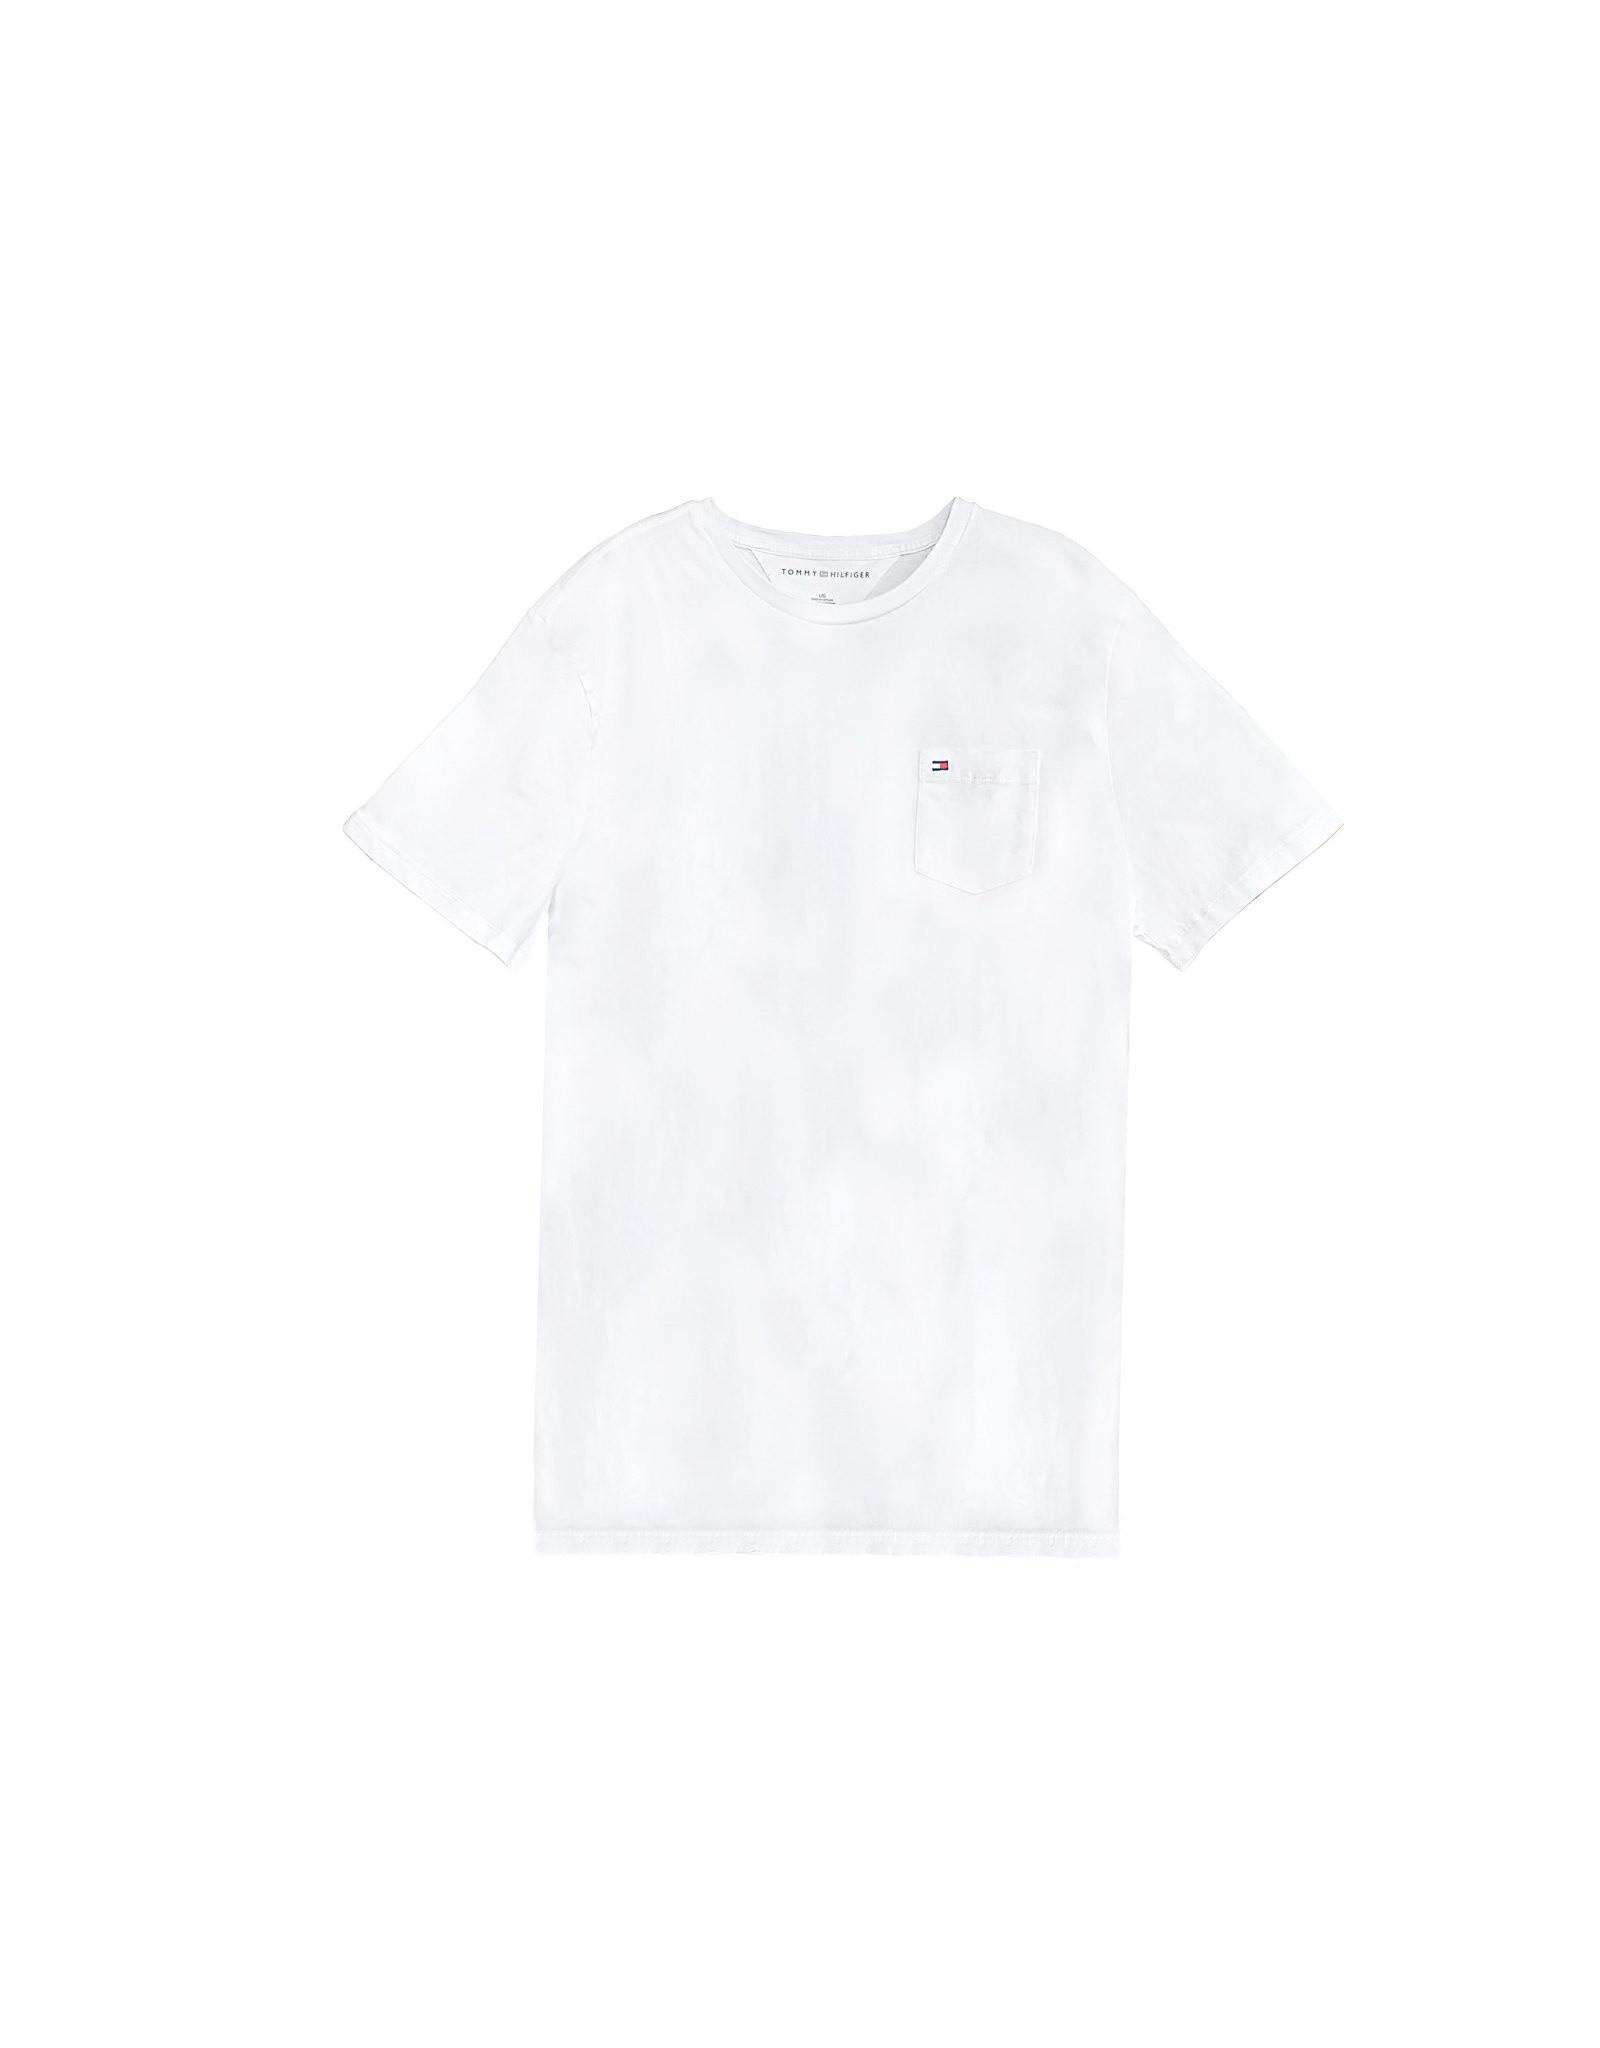 Tommy Hilfiger Tommy Hilfiger  T-shirt  Size L